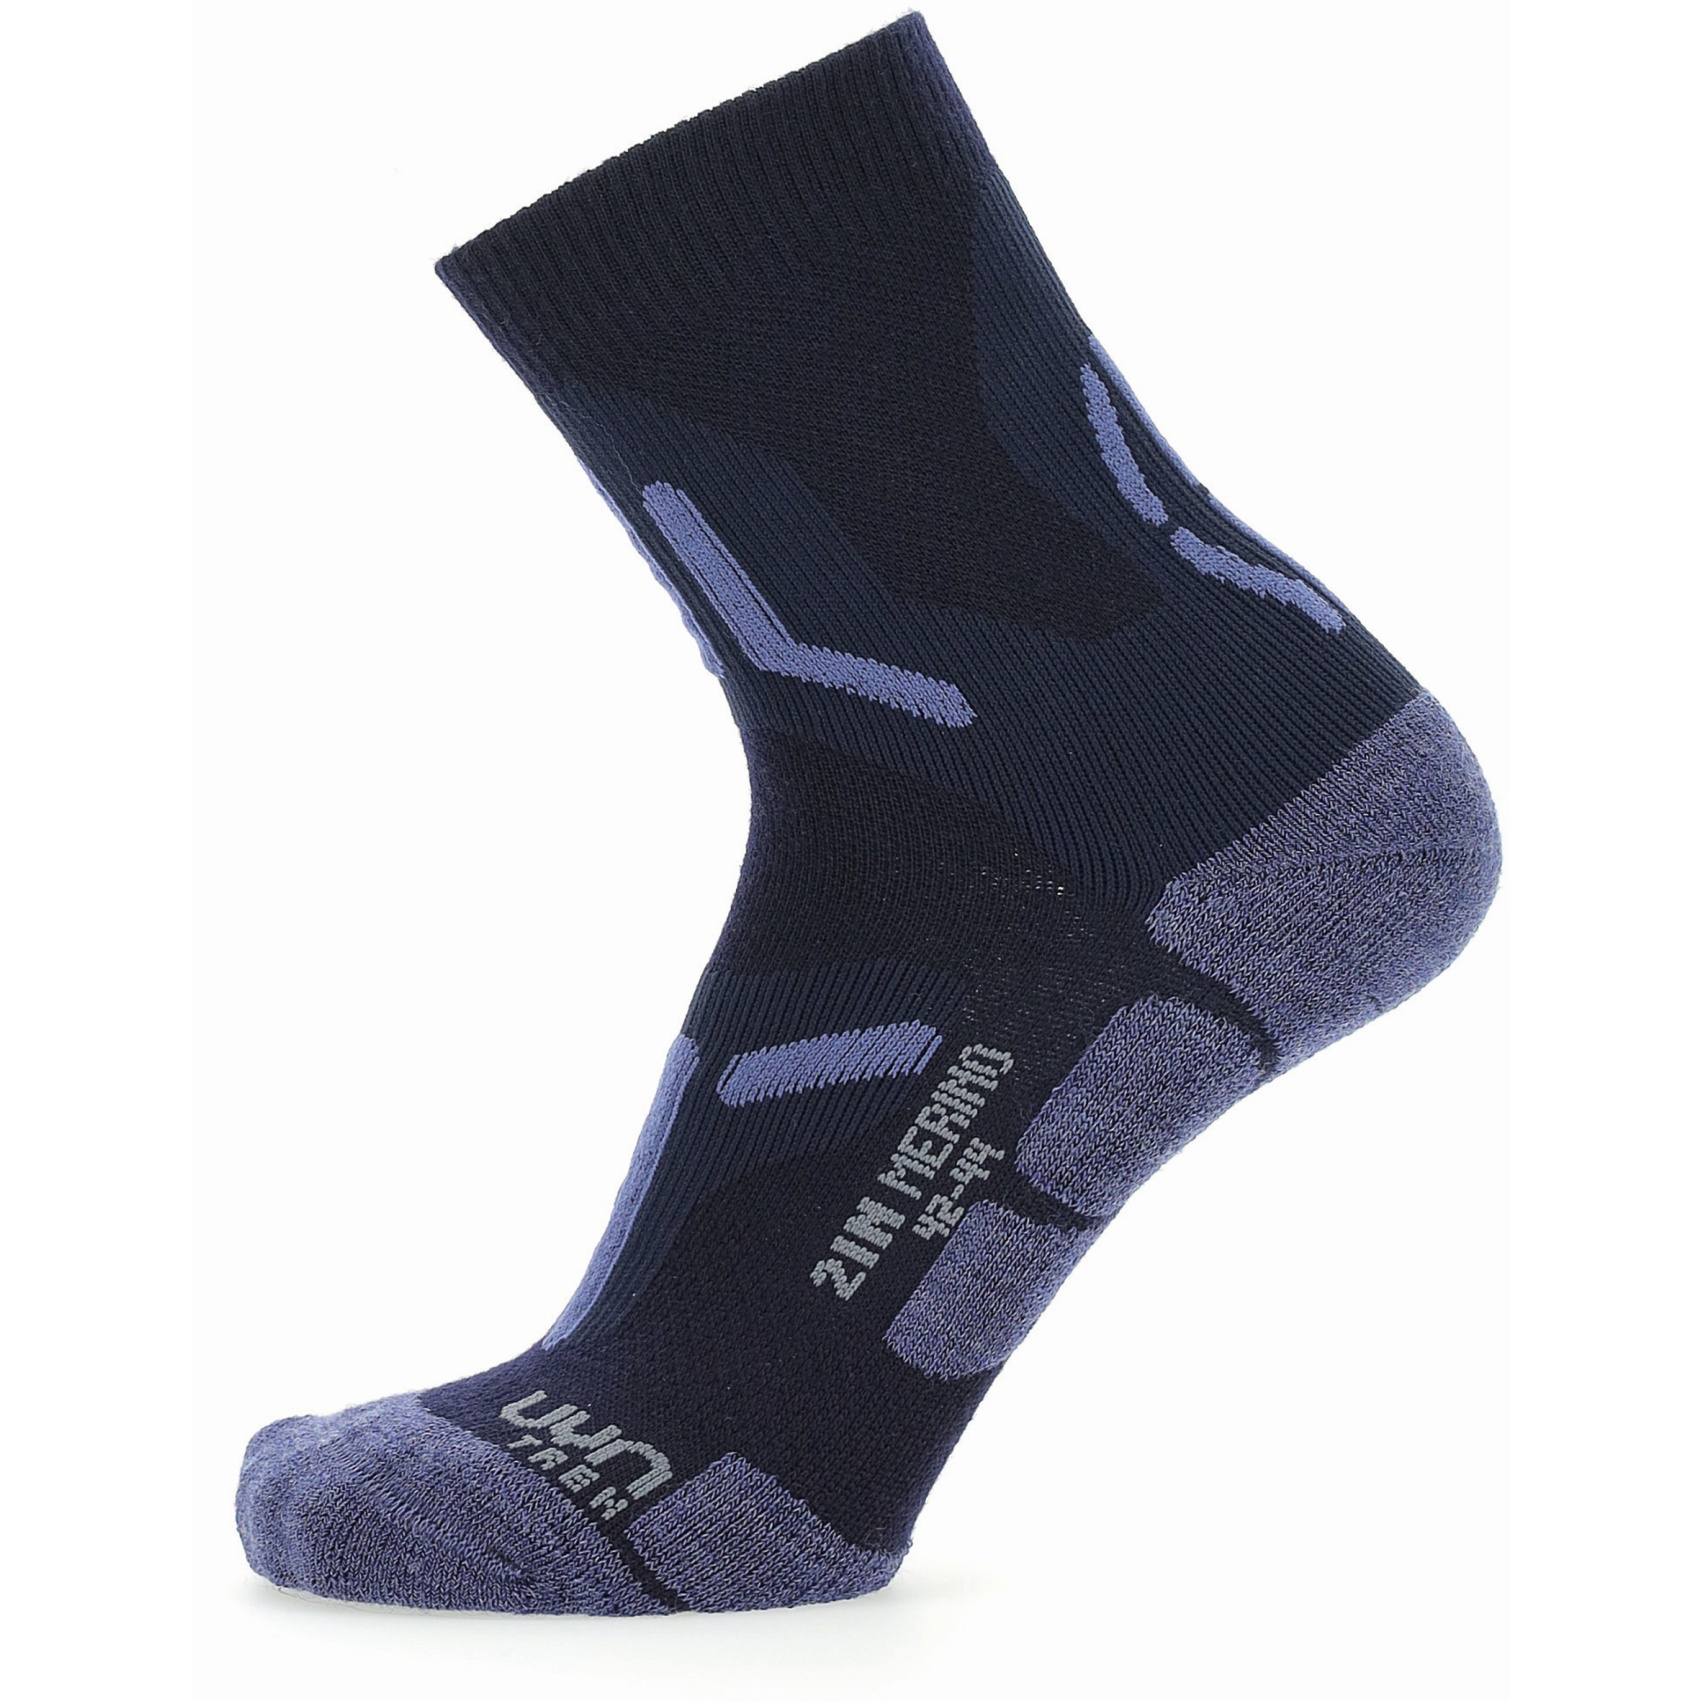 UYN Trekking 2In Merino Socks - Navy/Jeans